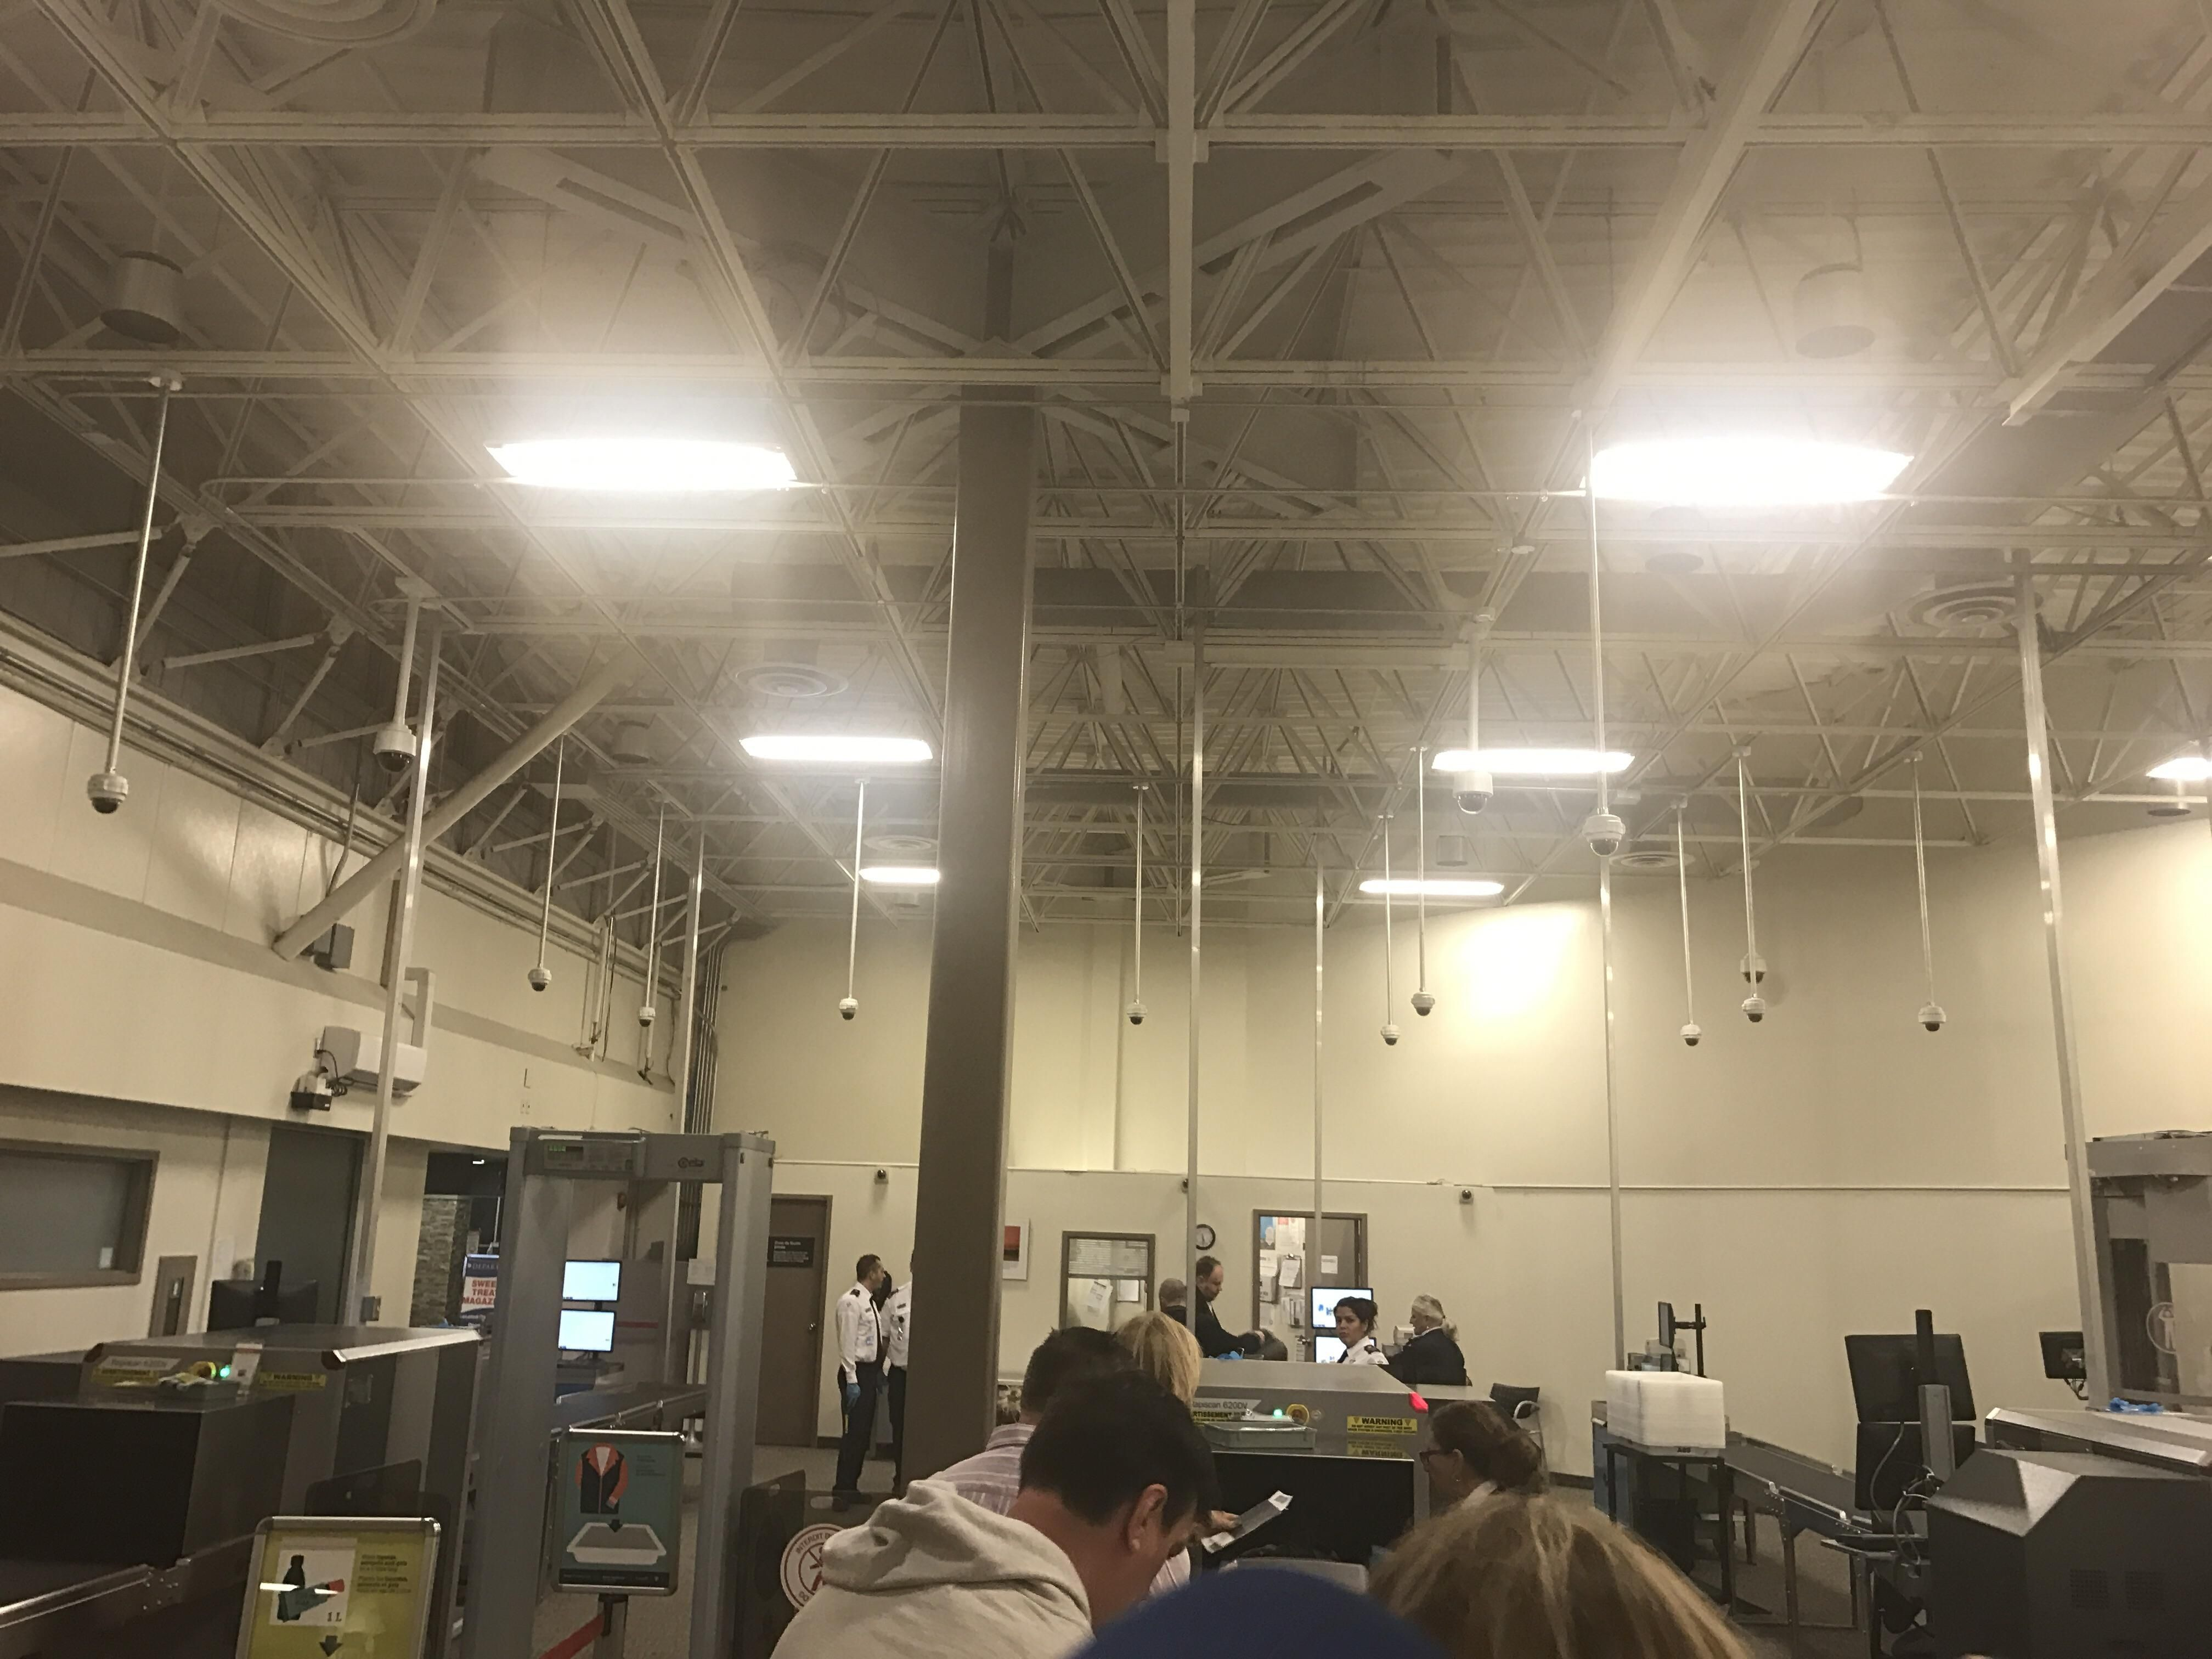 hamilton ontario airport